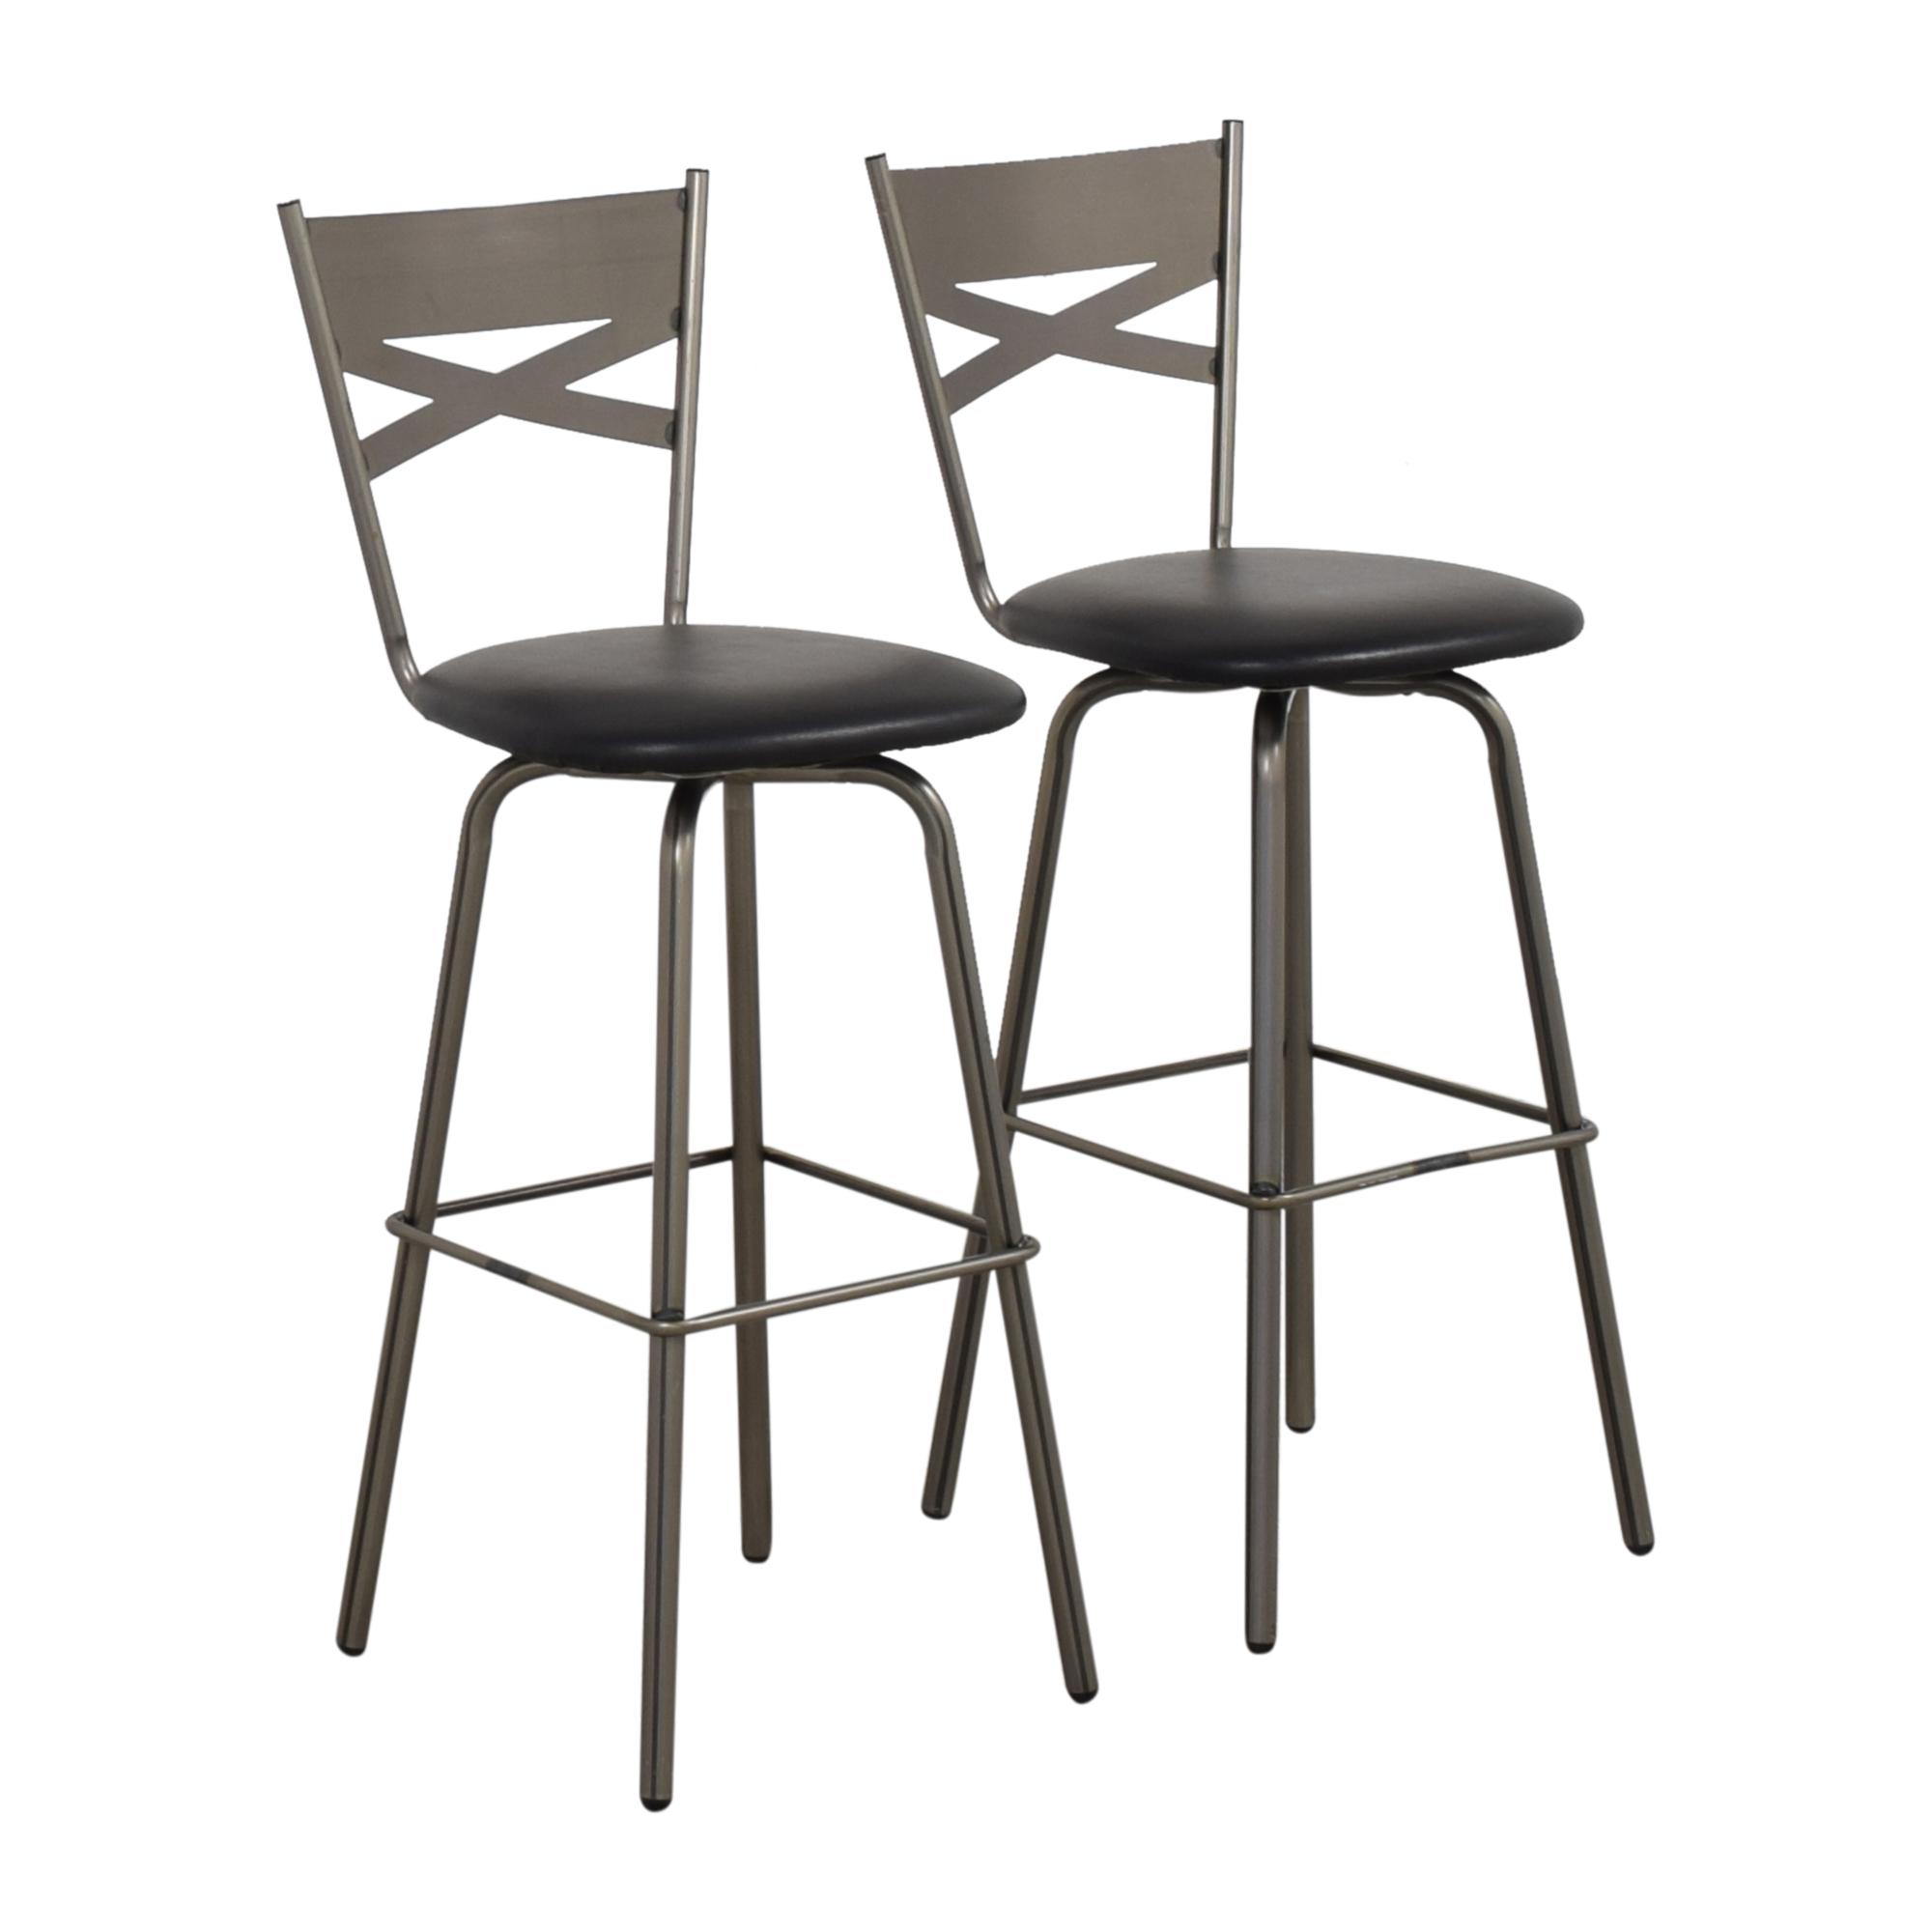 buy Amisco Amisco Modern Bar Stools online